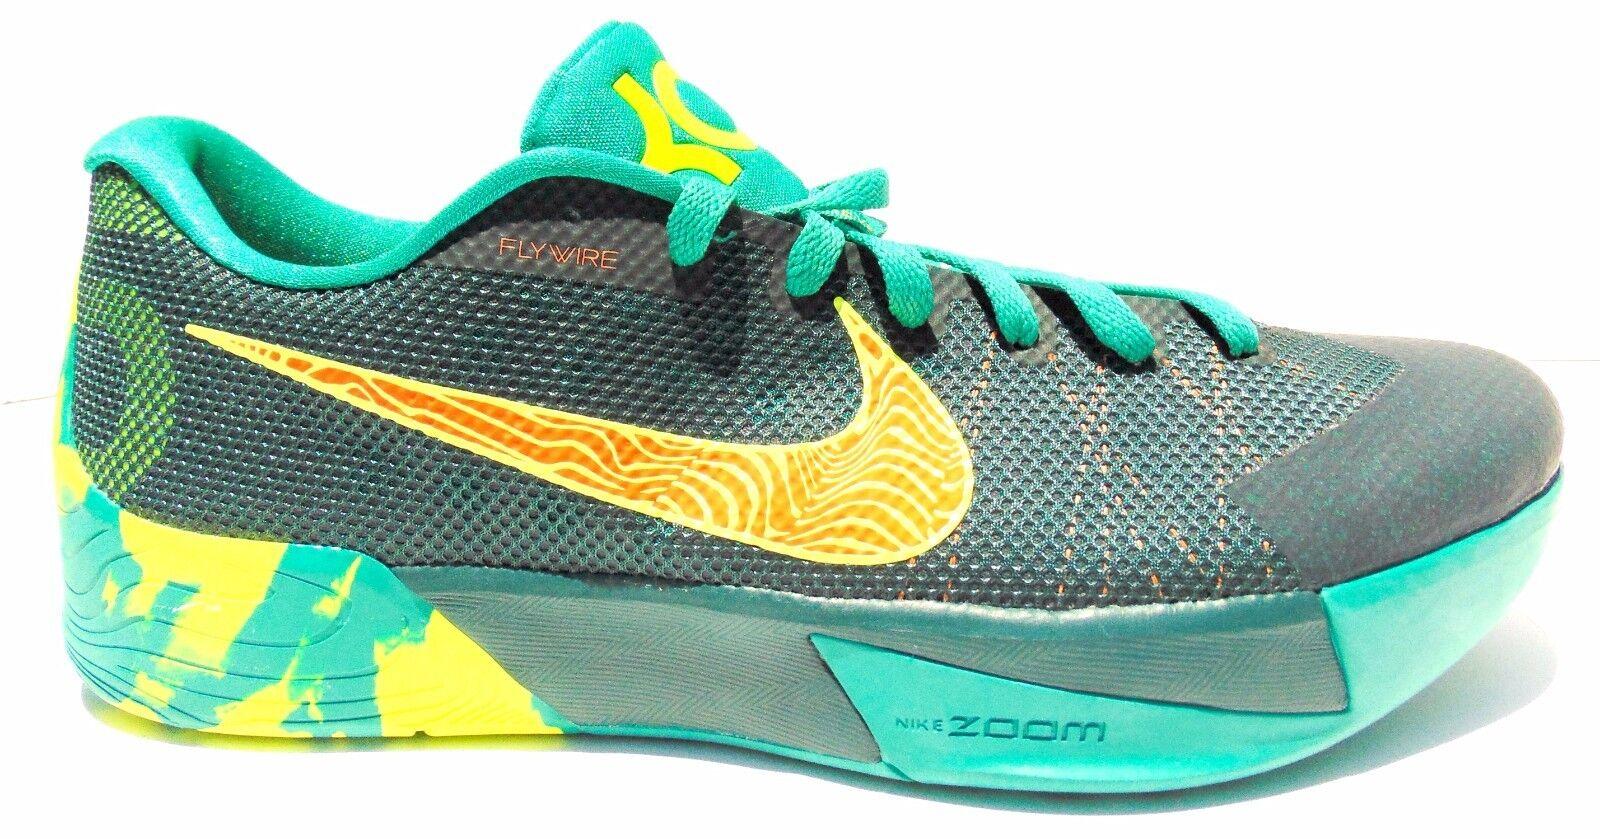 Nike kd smaragd trey 5 ii schuhe dunklen smaragd kd - orange sz 12 insgesamt 83f53e